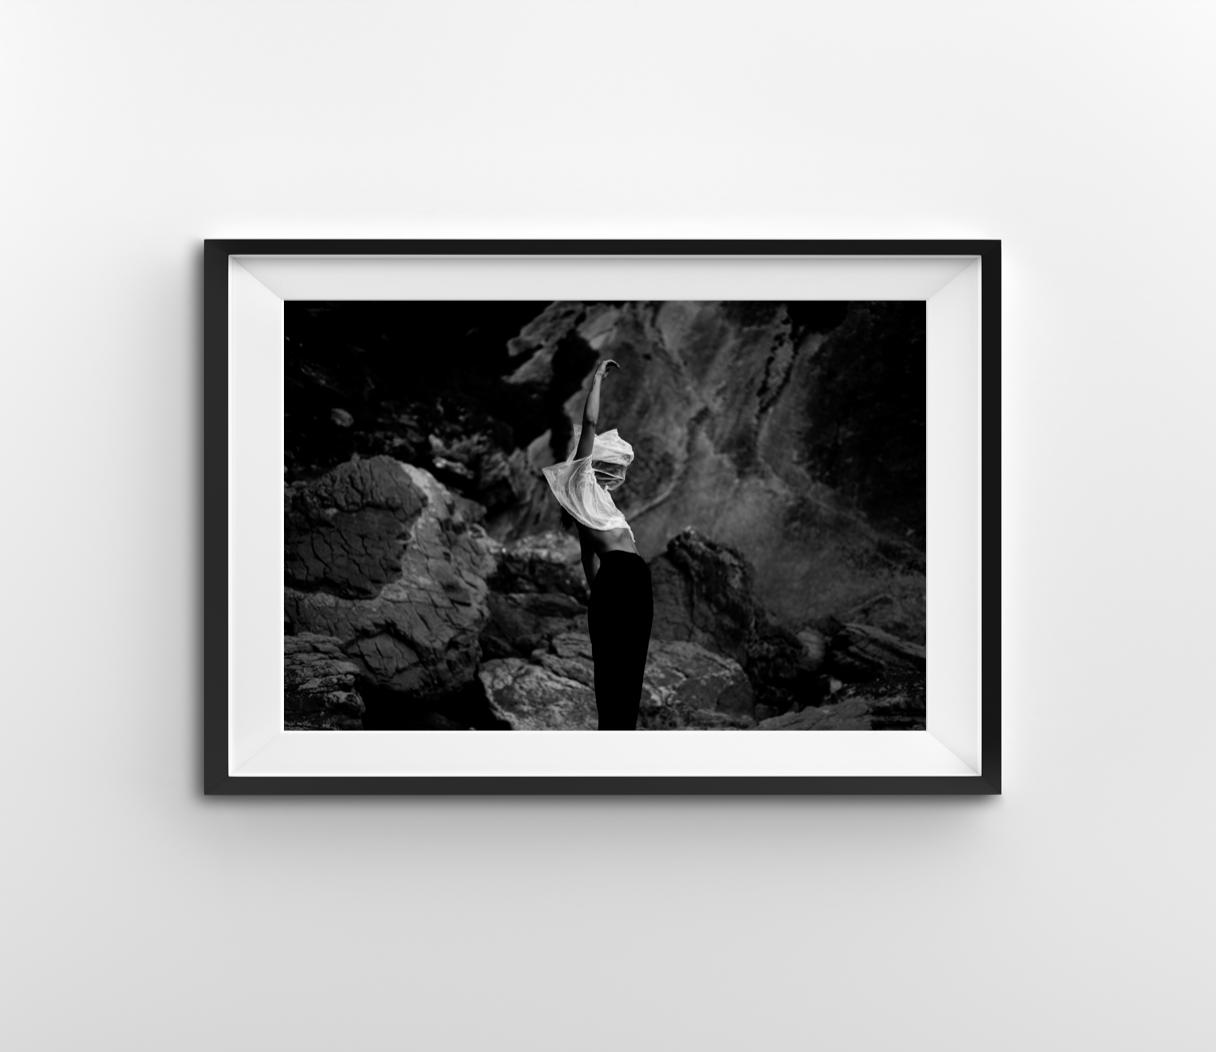 _DSC1686 - framed.png